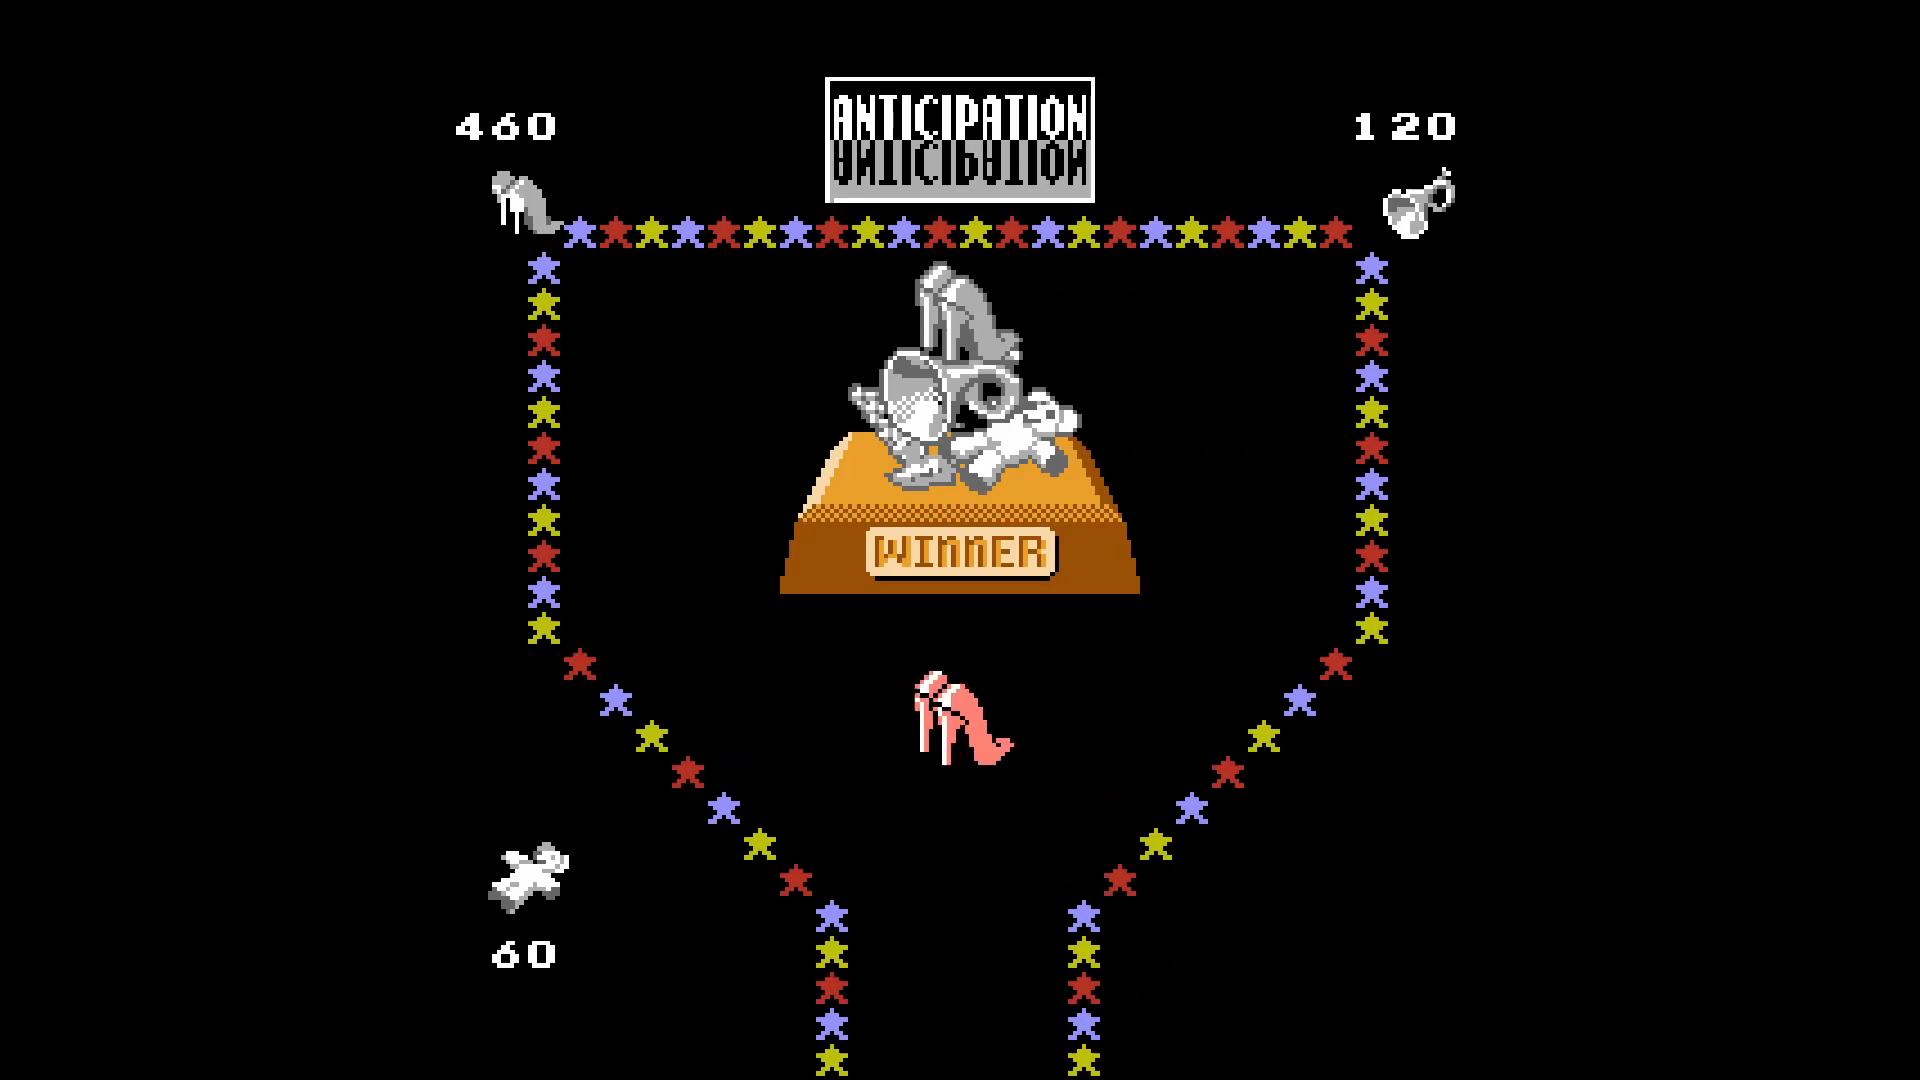 AkinNahtanoj: Anticipation [2 Computer Opponents/ Medium] (NES/Famicom Emulated) 460 points on 2020-10-01 16:26:54